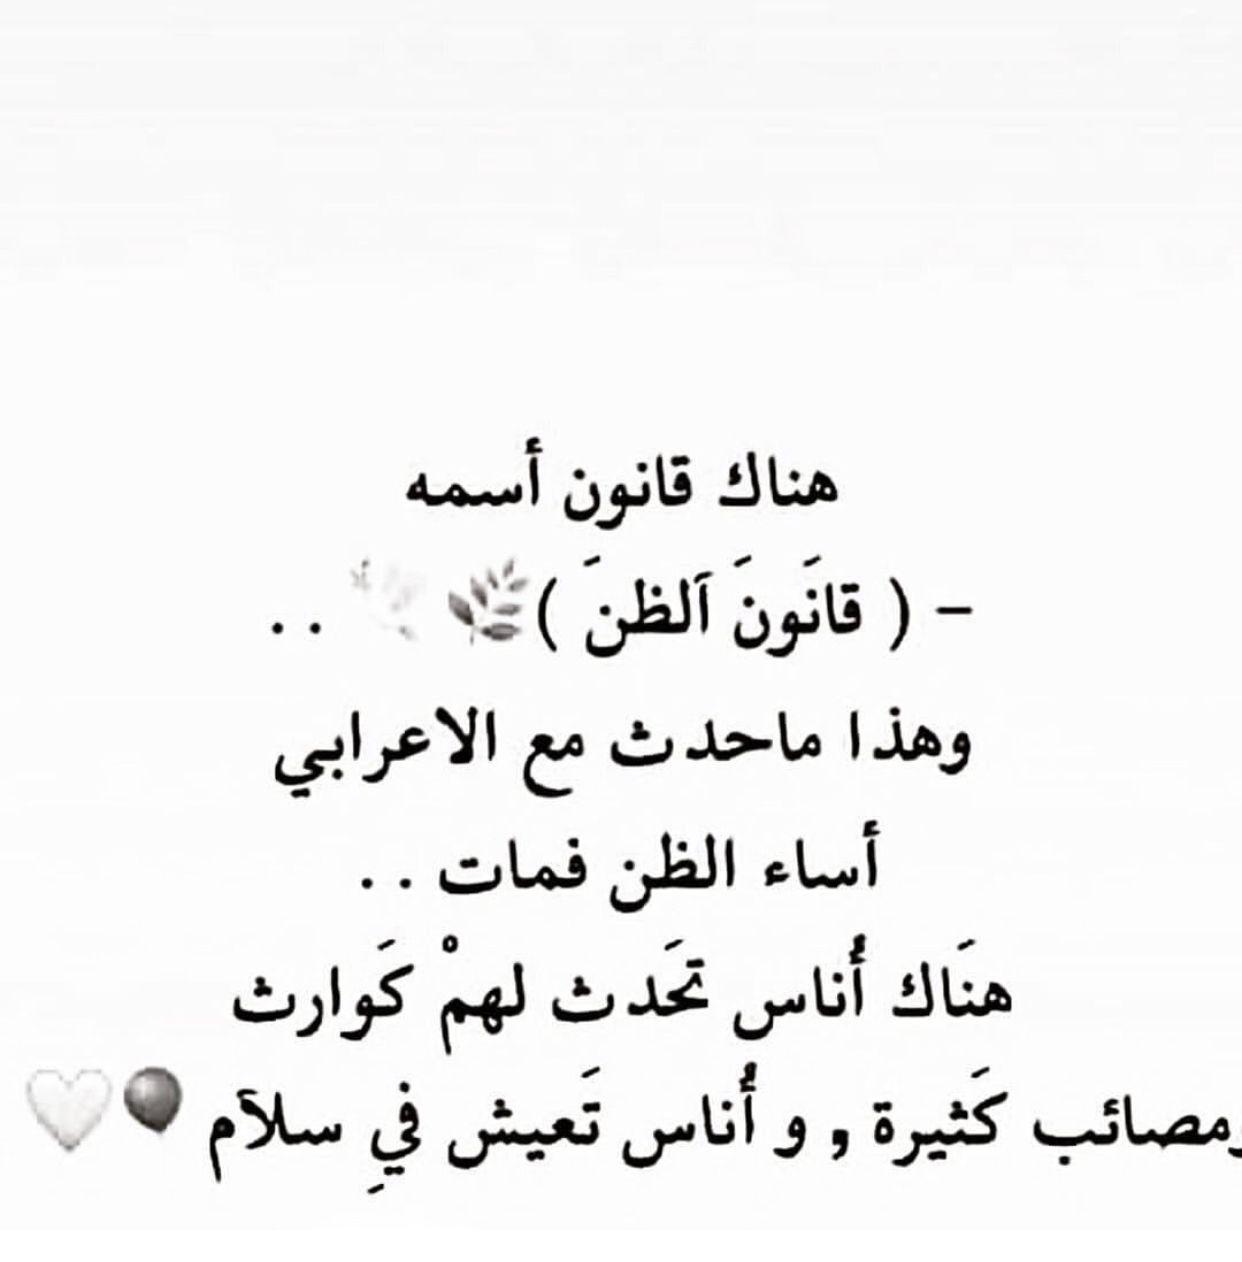 Pin By خليفه On كلمات Calligraphy Arabic Calligraphy Arabic